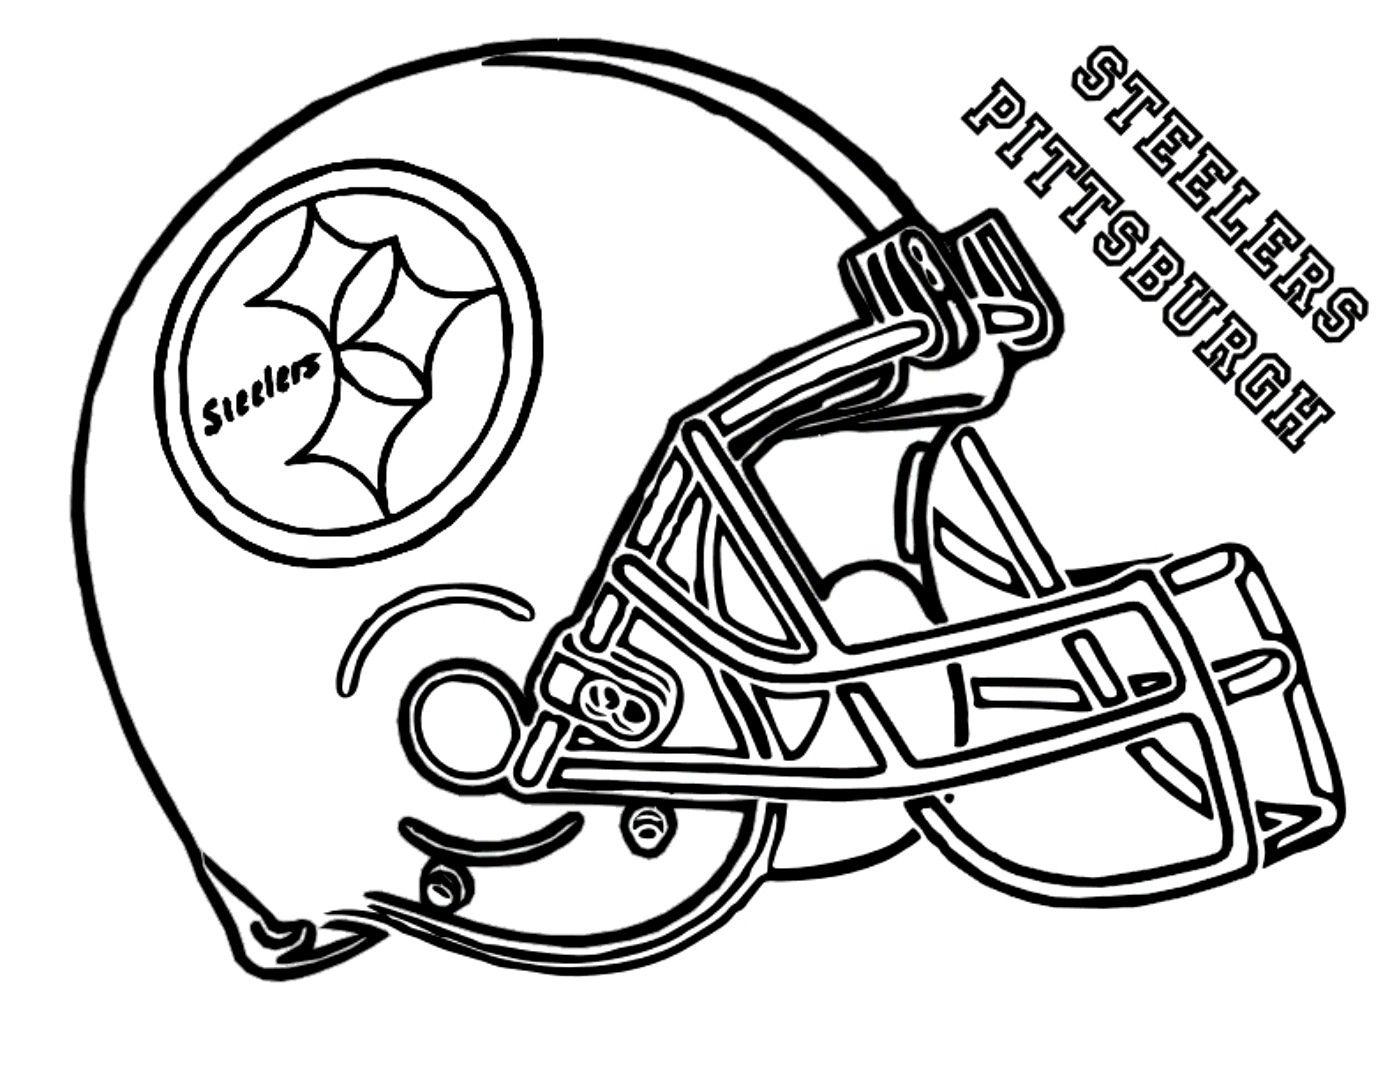 huge discount 3ecdb 1477b Pin by Brenda Guerrero on arts n crafts | Football helmets ...